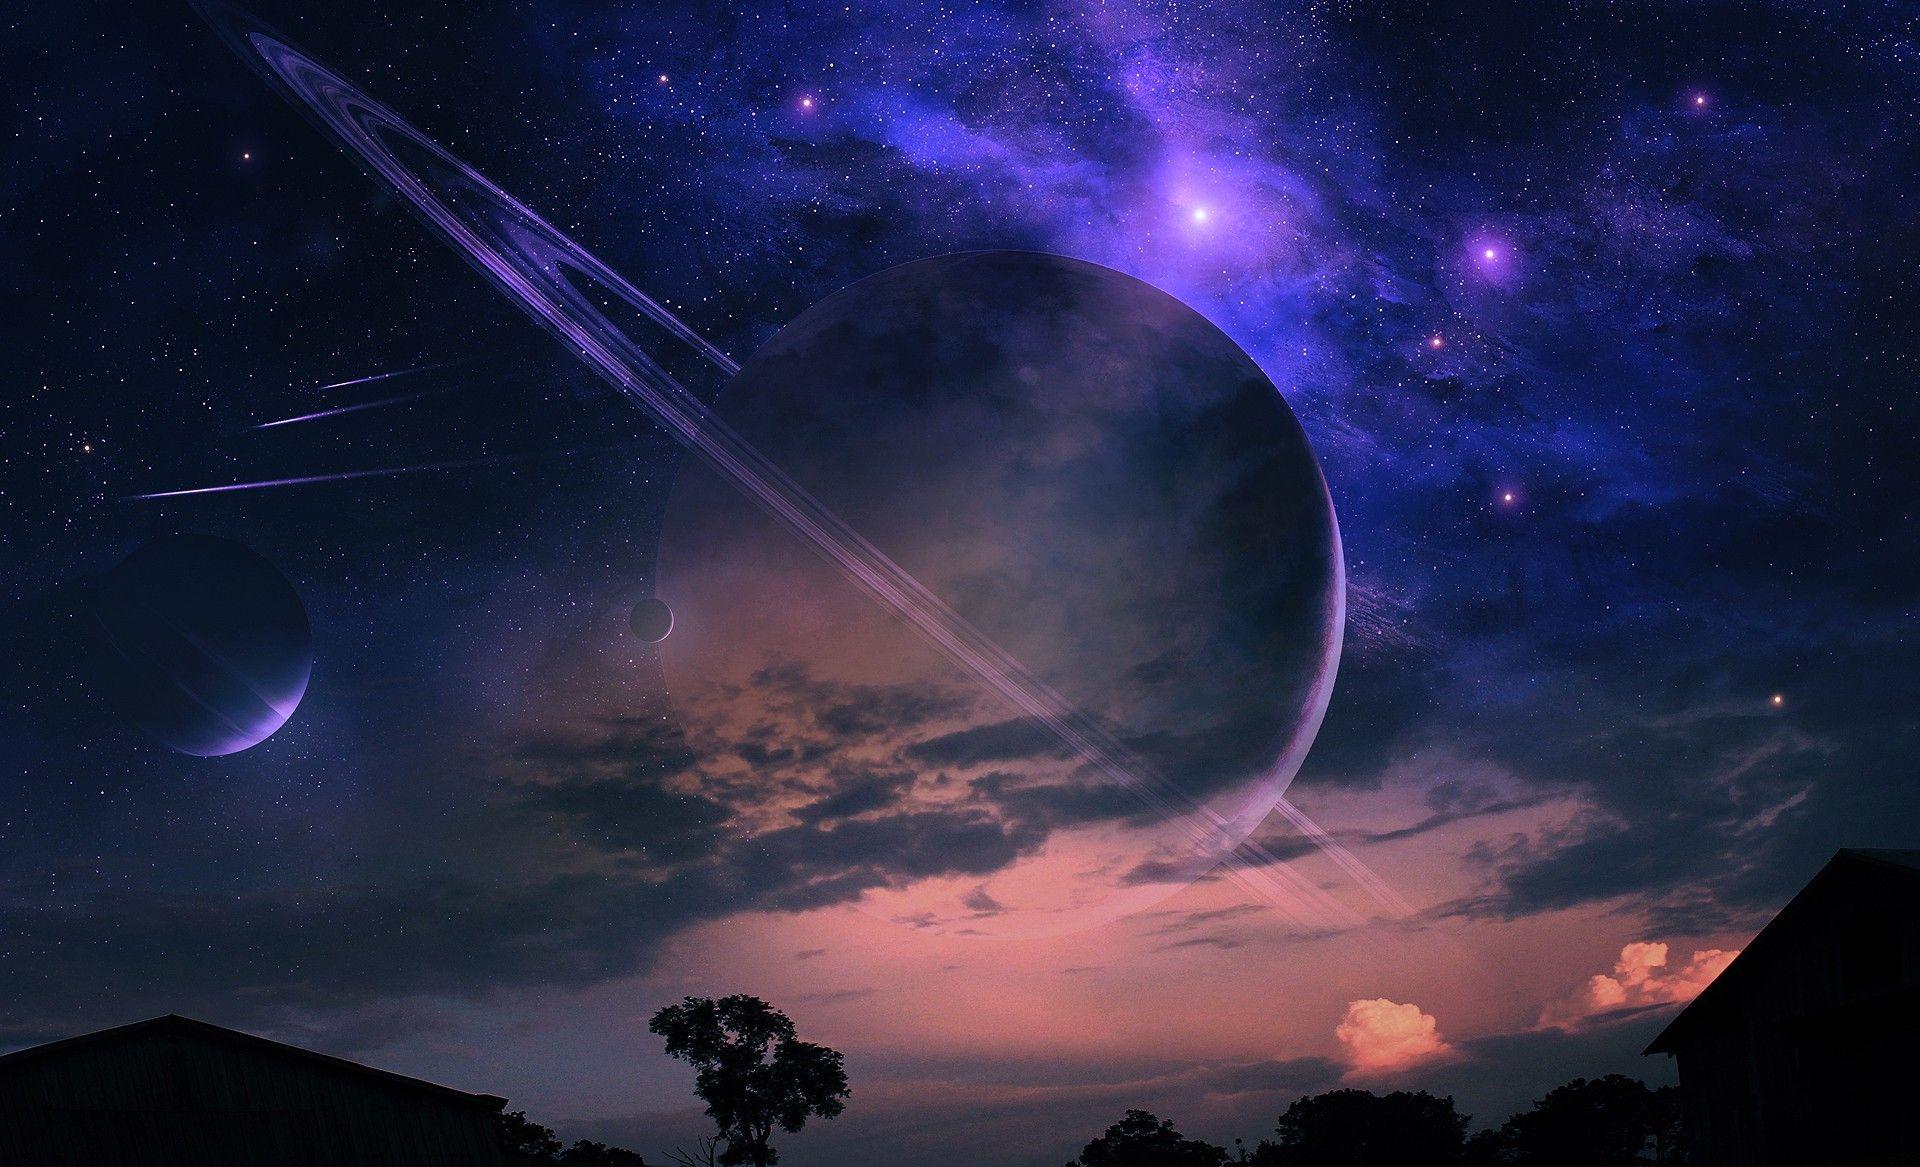 sci fi fantasy landscape | landscape night house tree cloud nebula